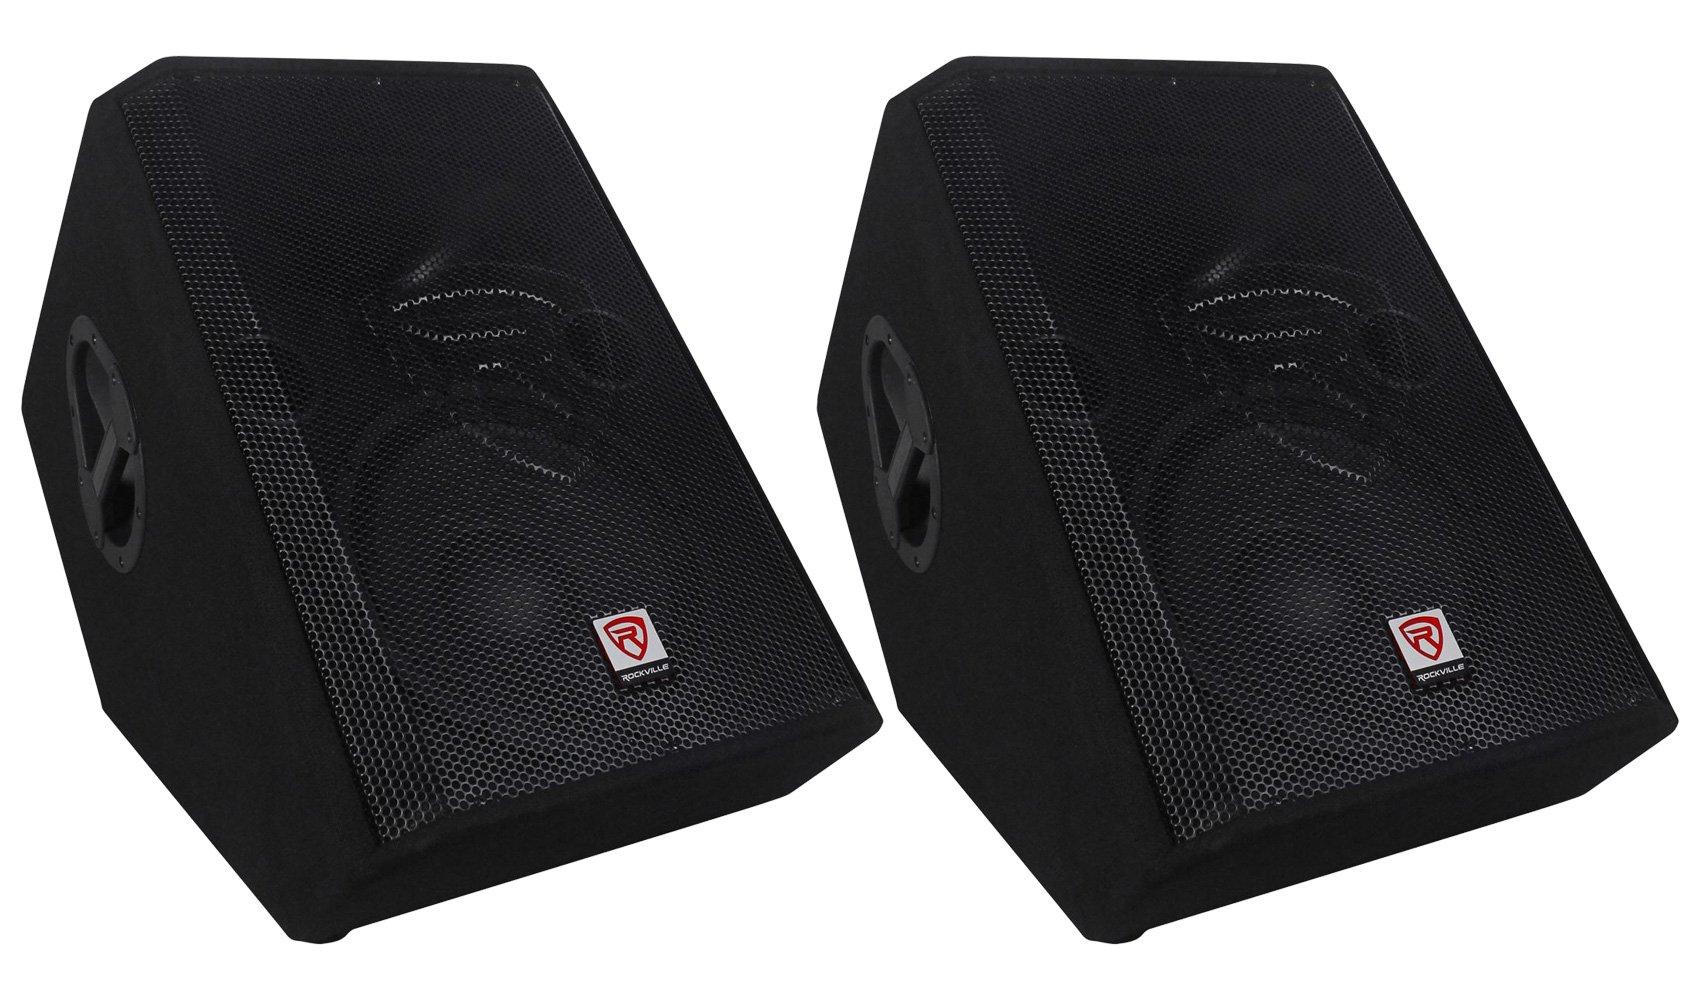 (2) Rockville RSM12P 12'' 2-Way Passive Floor Stage Monitor Speakers Totaling 2000 Watt Peak/1000 Watt Program Power/500 Watt RMS With 2.5'' KSV Voice Coils For Deep Bass and Incredible Acoustic Power